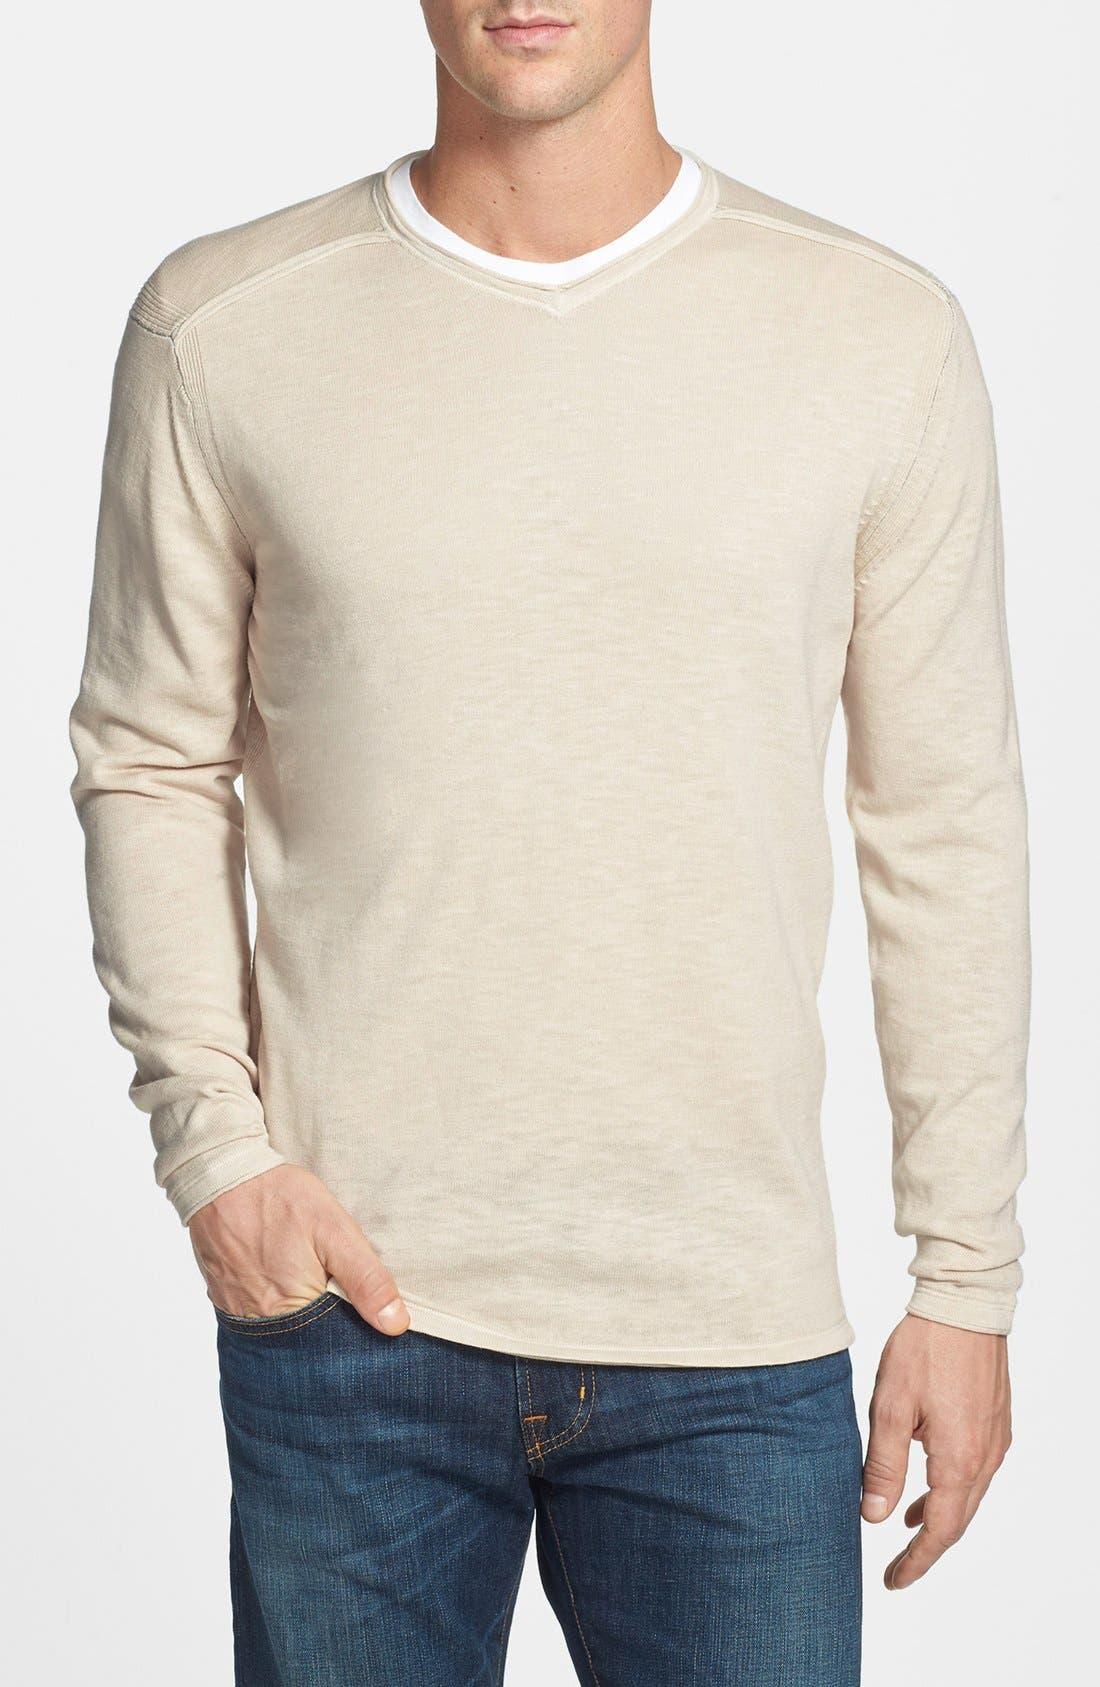 Alternate Image 1 Selected - Tommy Bahama Denim 'Sandstone Beach' Cotton V-Neck Sweatshirt